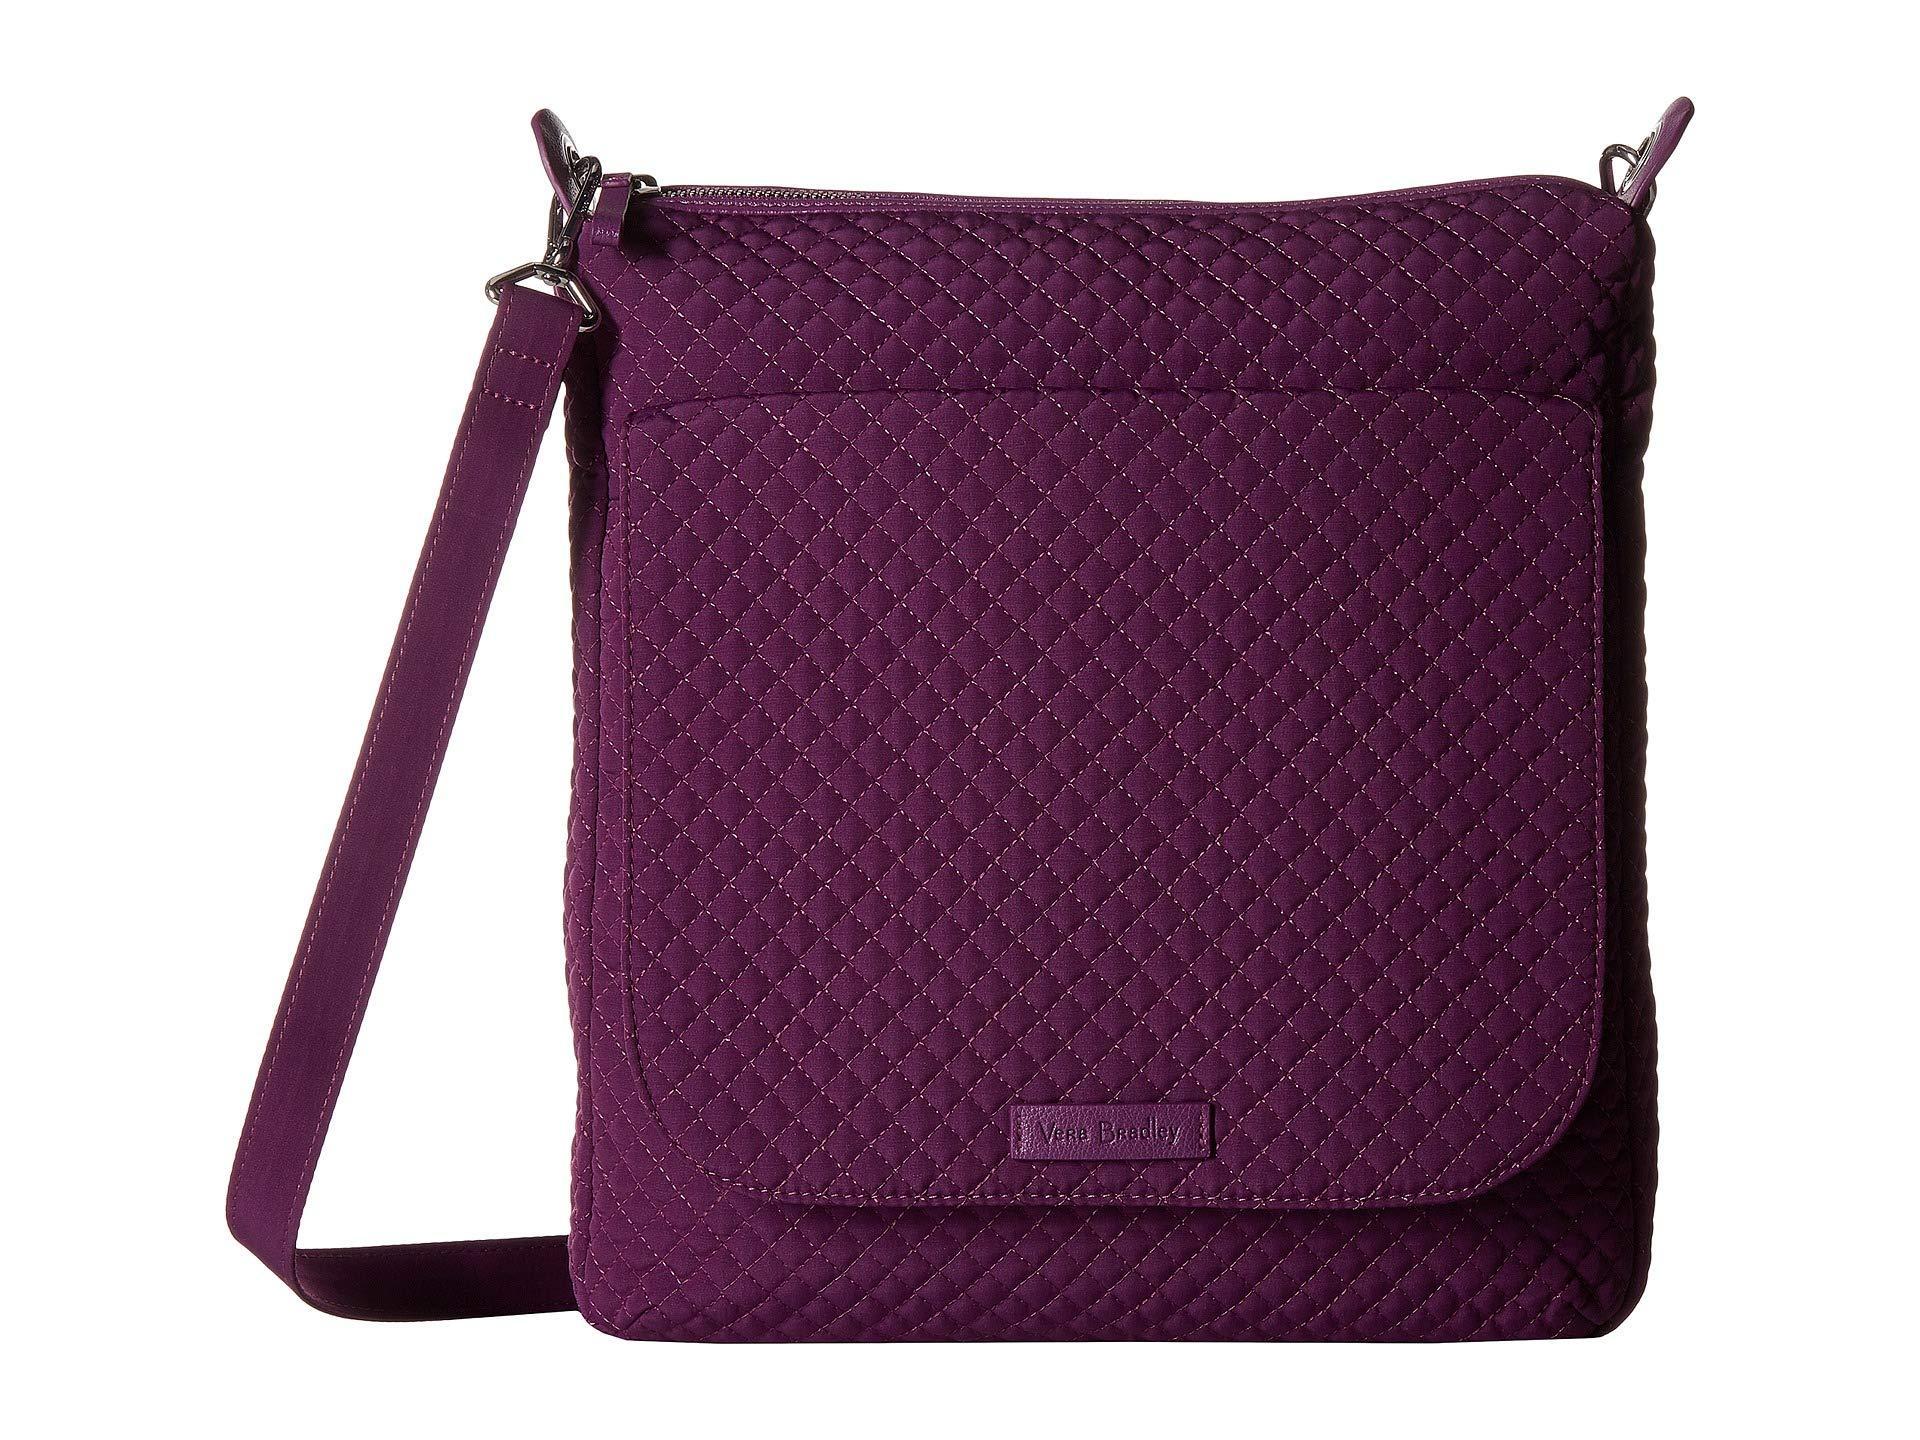 Lyst - Vera Bradley Carson Mailbag (pretty Posies) Bags in Purple 6aa78cdc4abf8